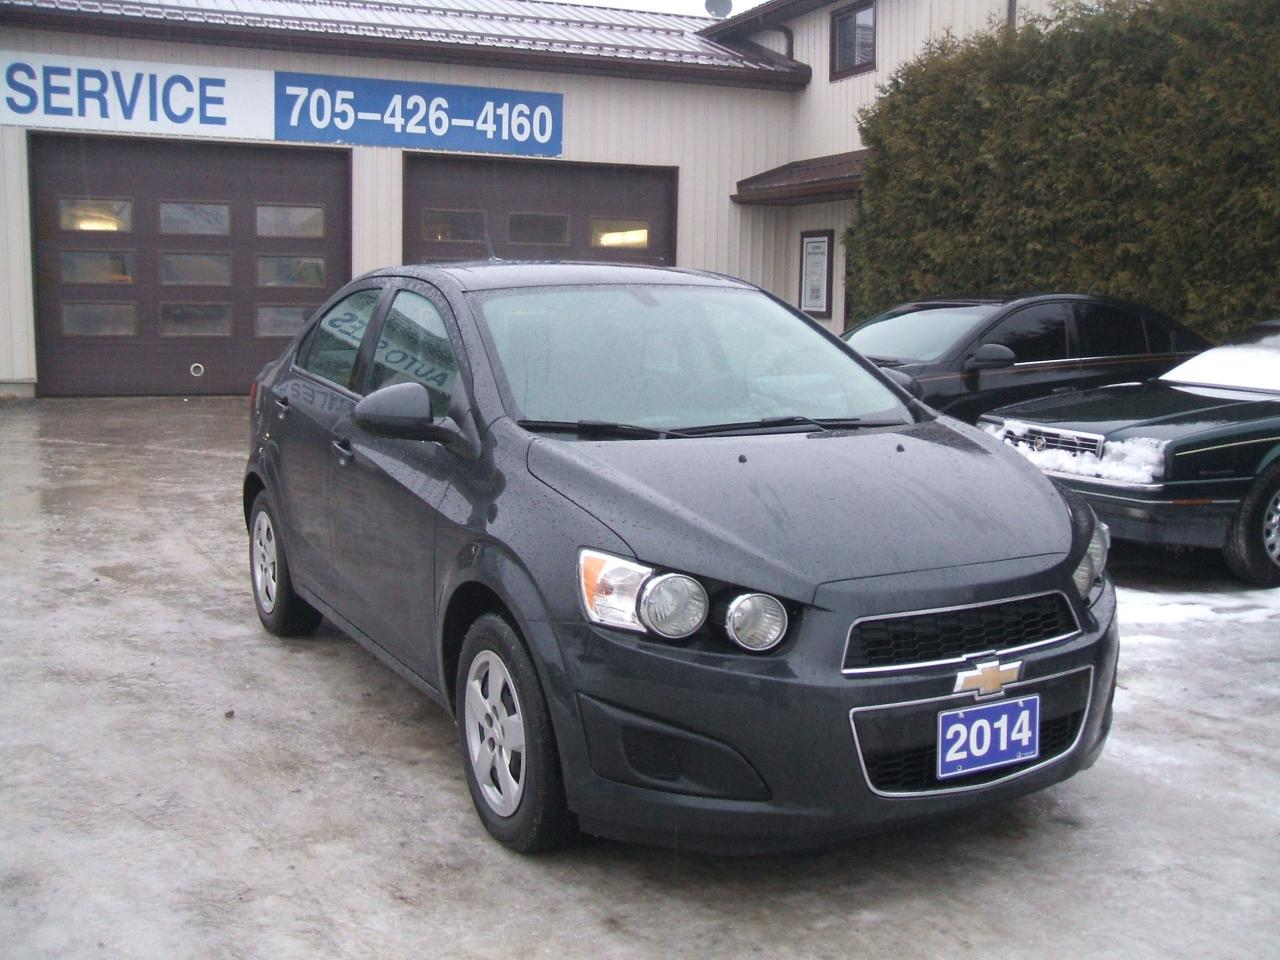 Photo of Grey 2014 Chevrolet Sonic